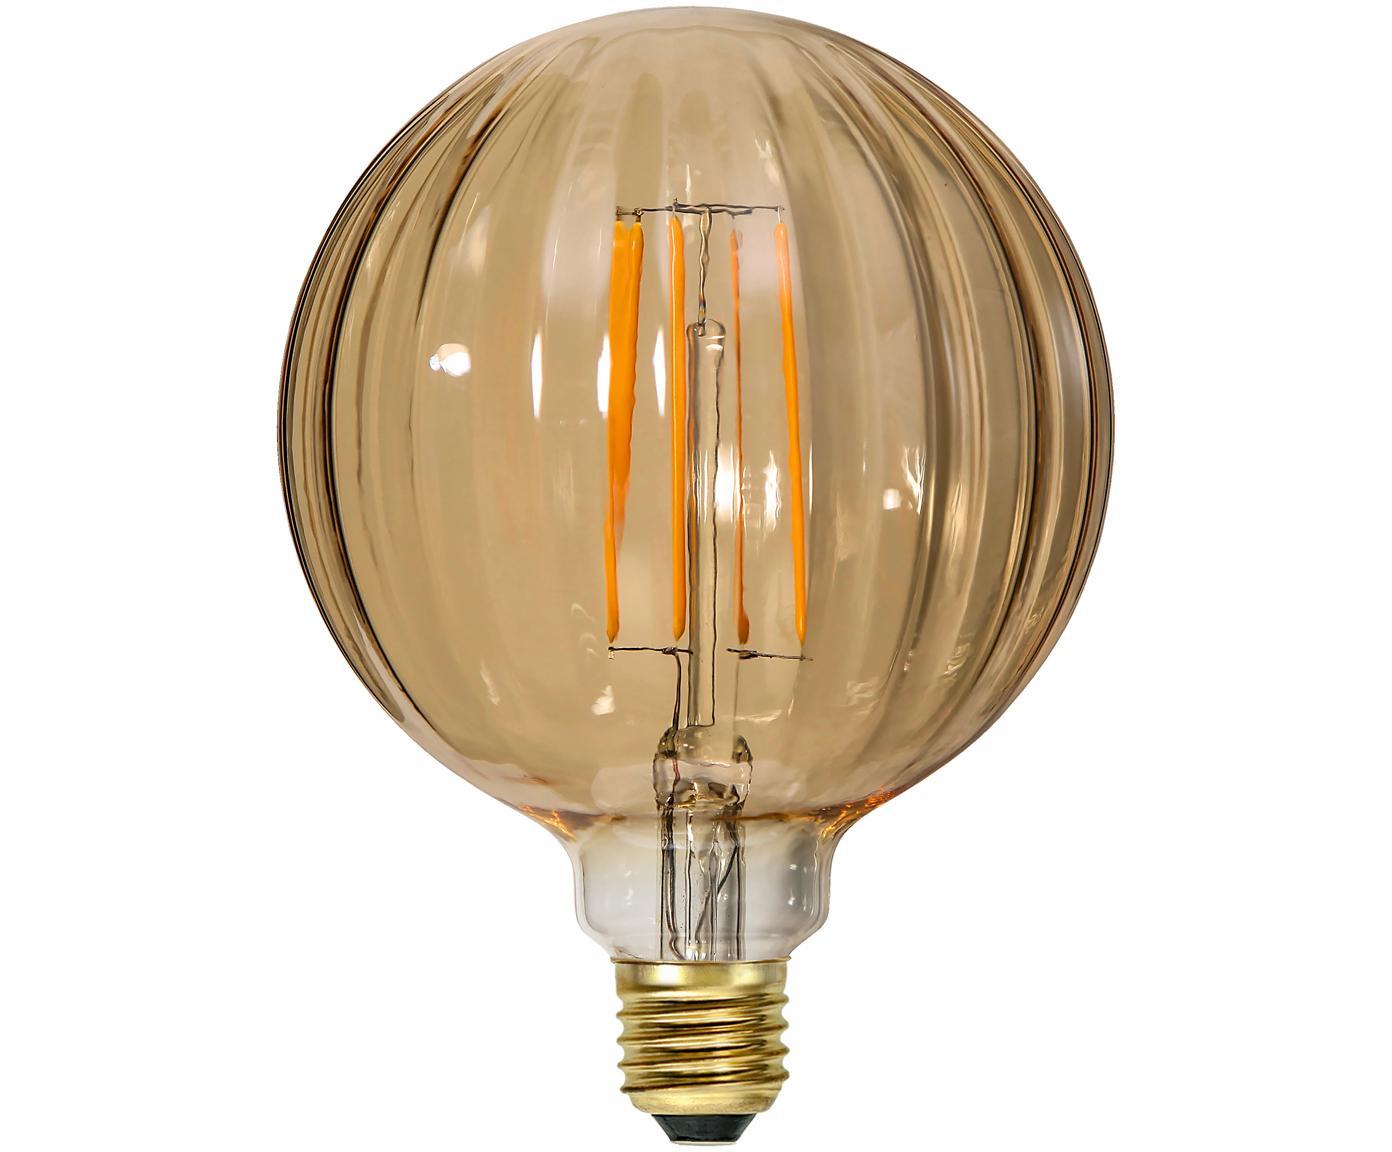 LED lamp Circy (E27 / 3W) , Peertje: glas, Fitting: nikkel, Amberkleurig, Ø 13 x H 17 cm